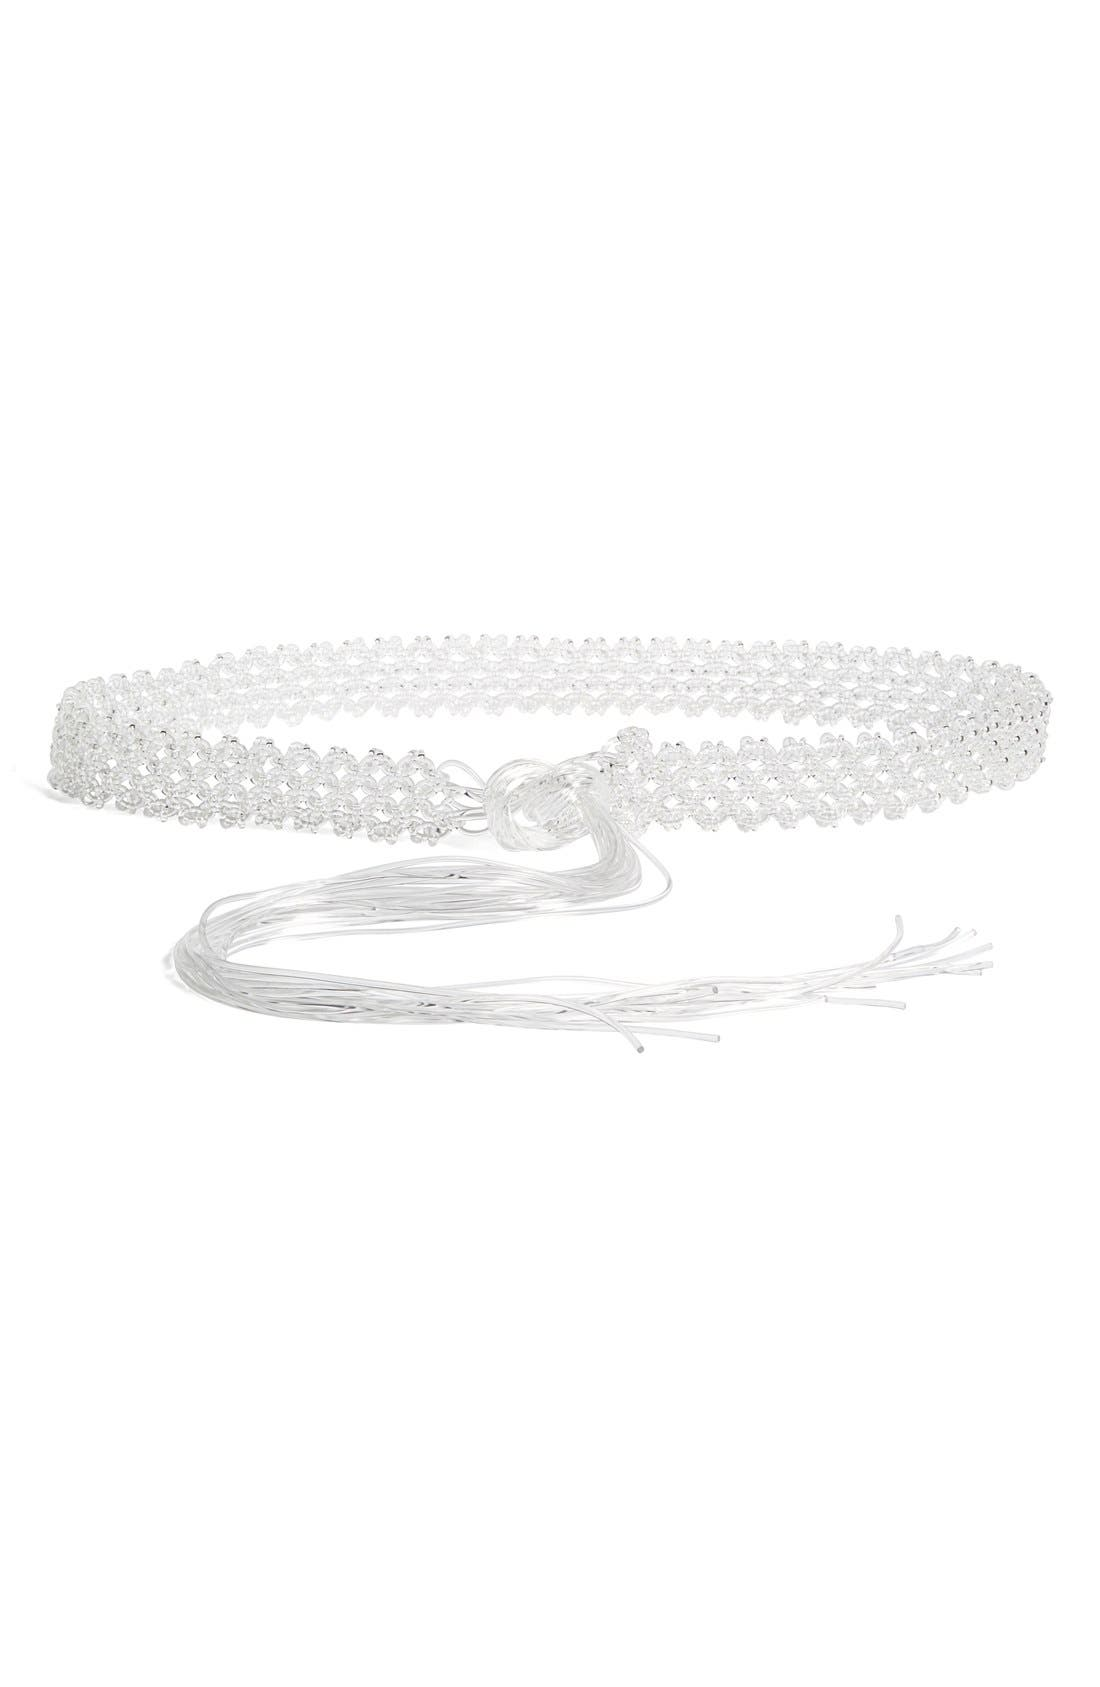 Alternate Image 1 Selected - Simone Rocha Jelly Cord Belt